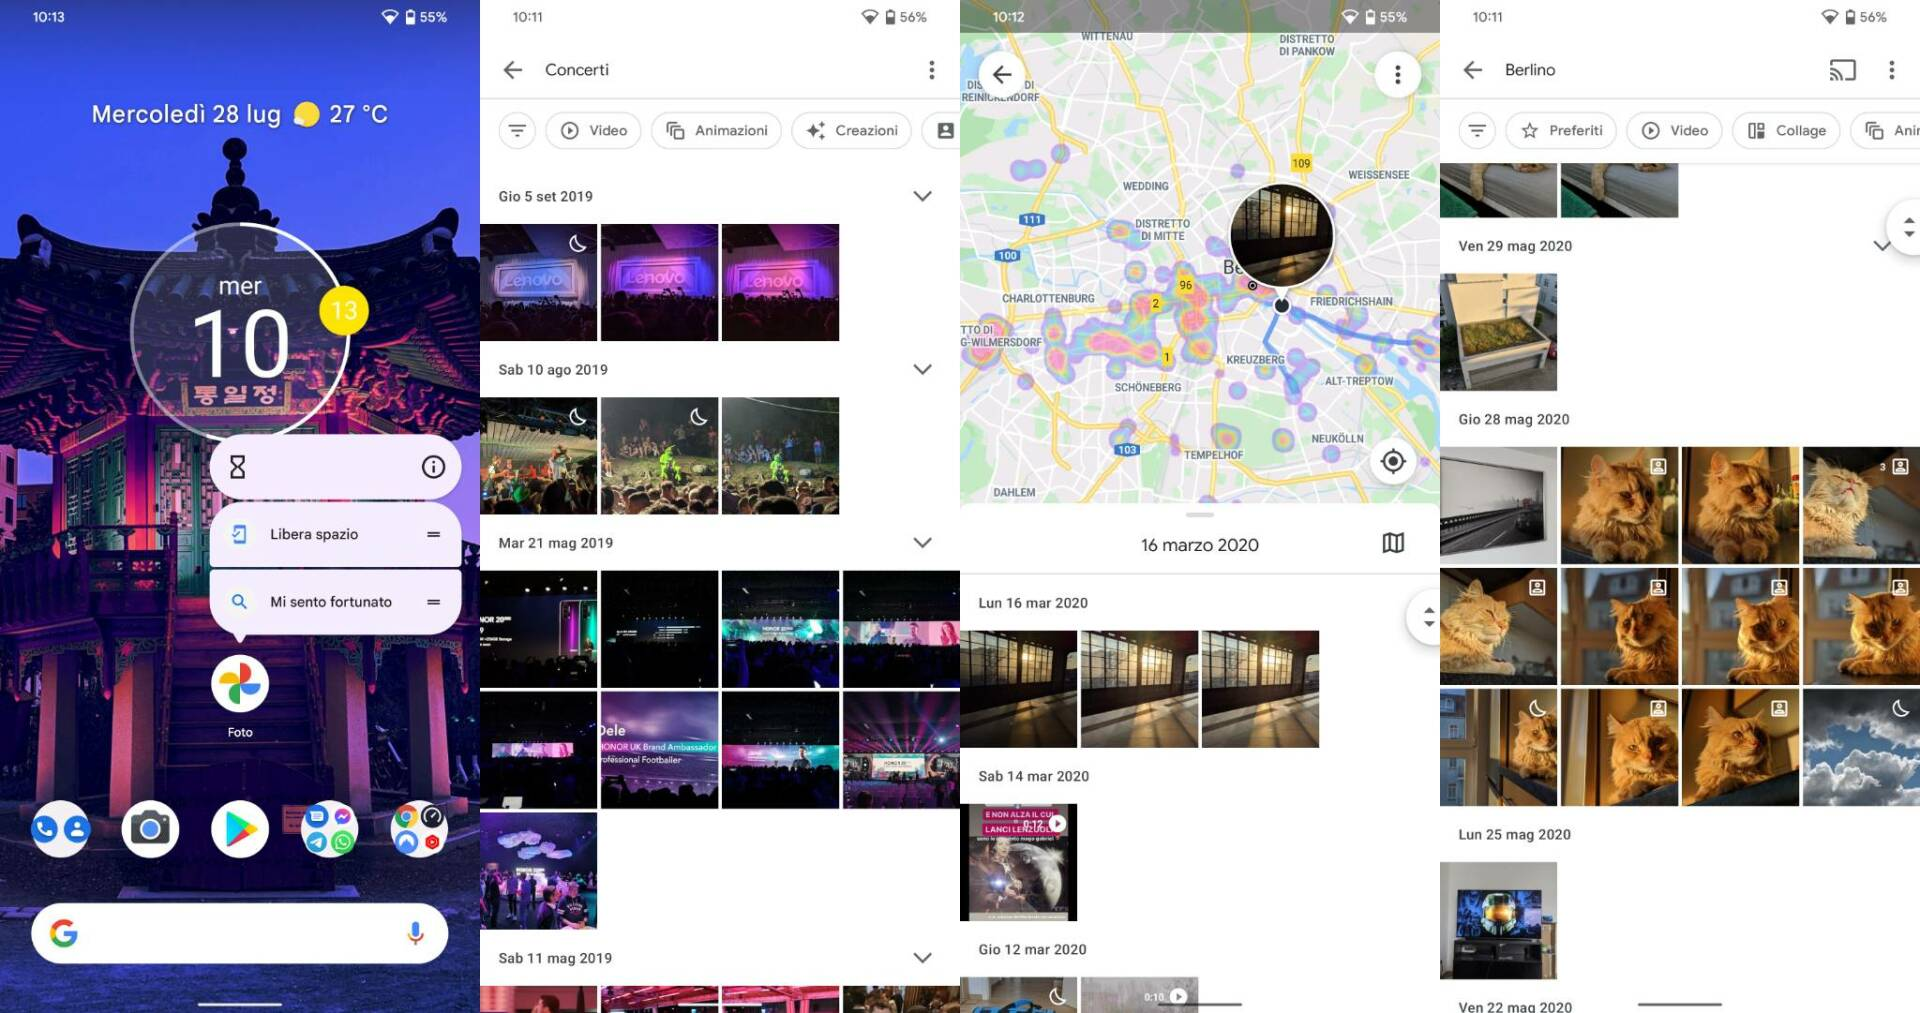 Google Foto - Mi sento fortunato